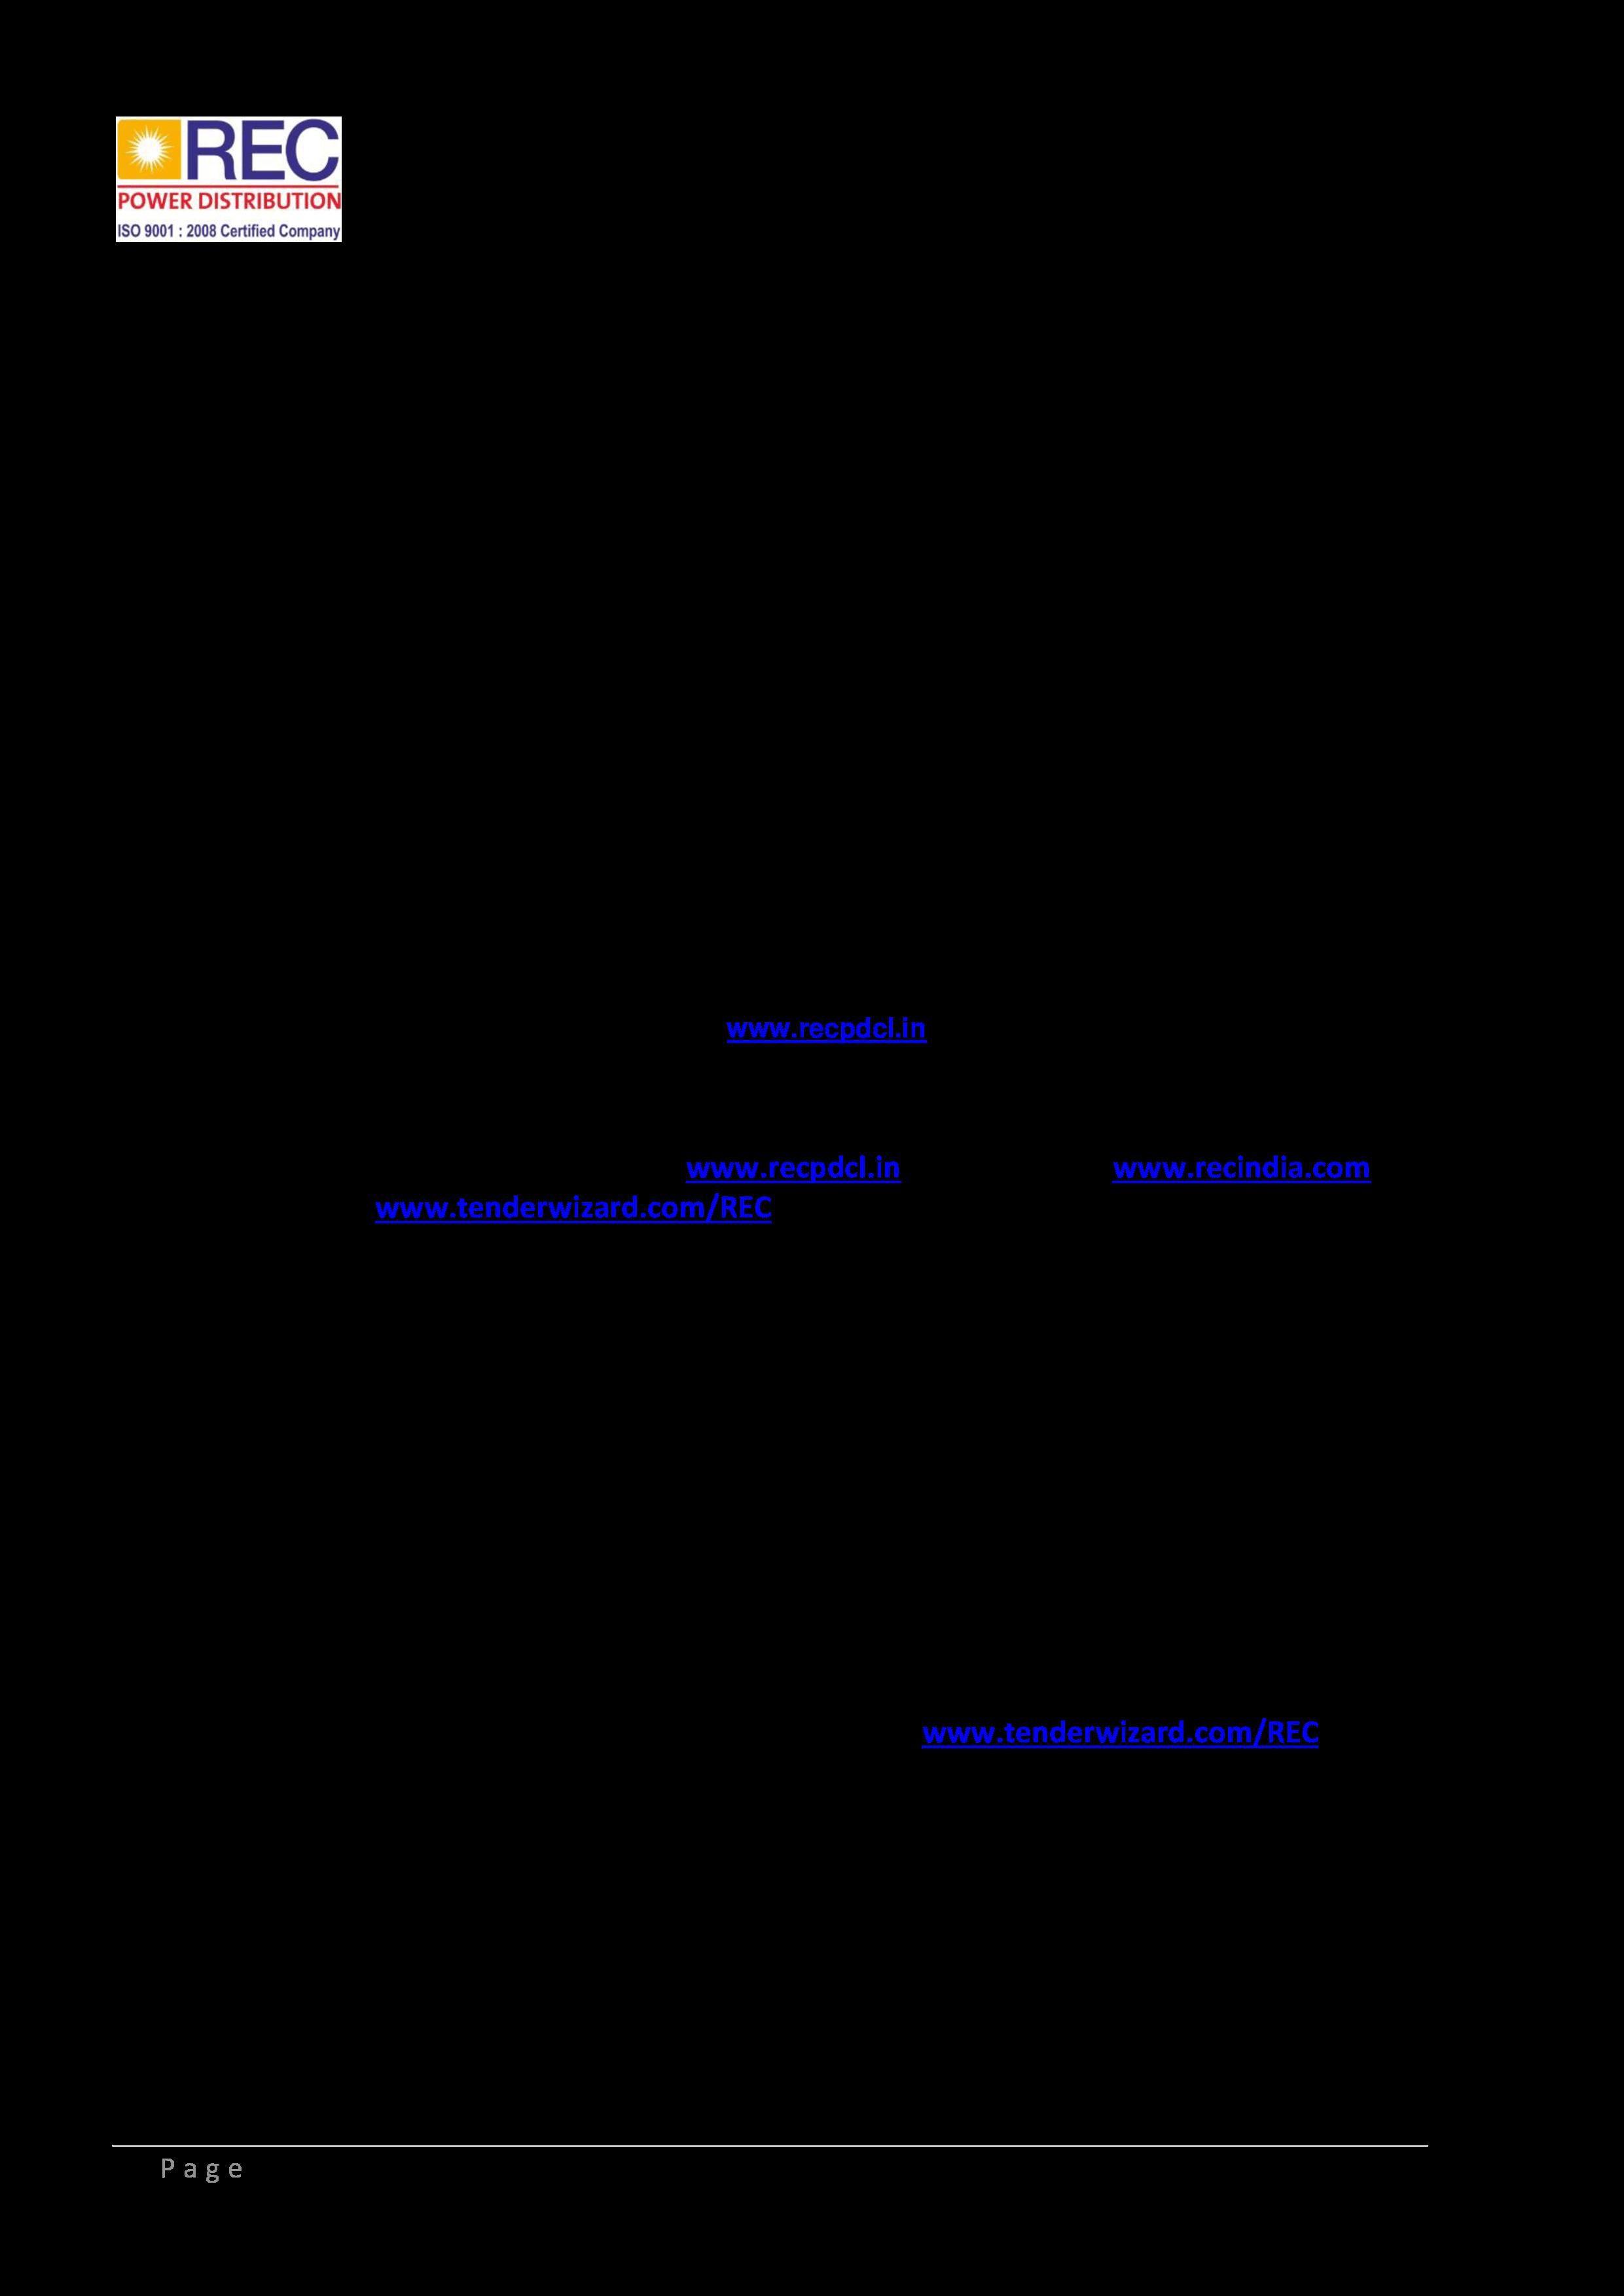 Digital Marketing Agency Proposal Template Sample PDF